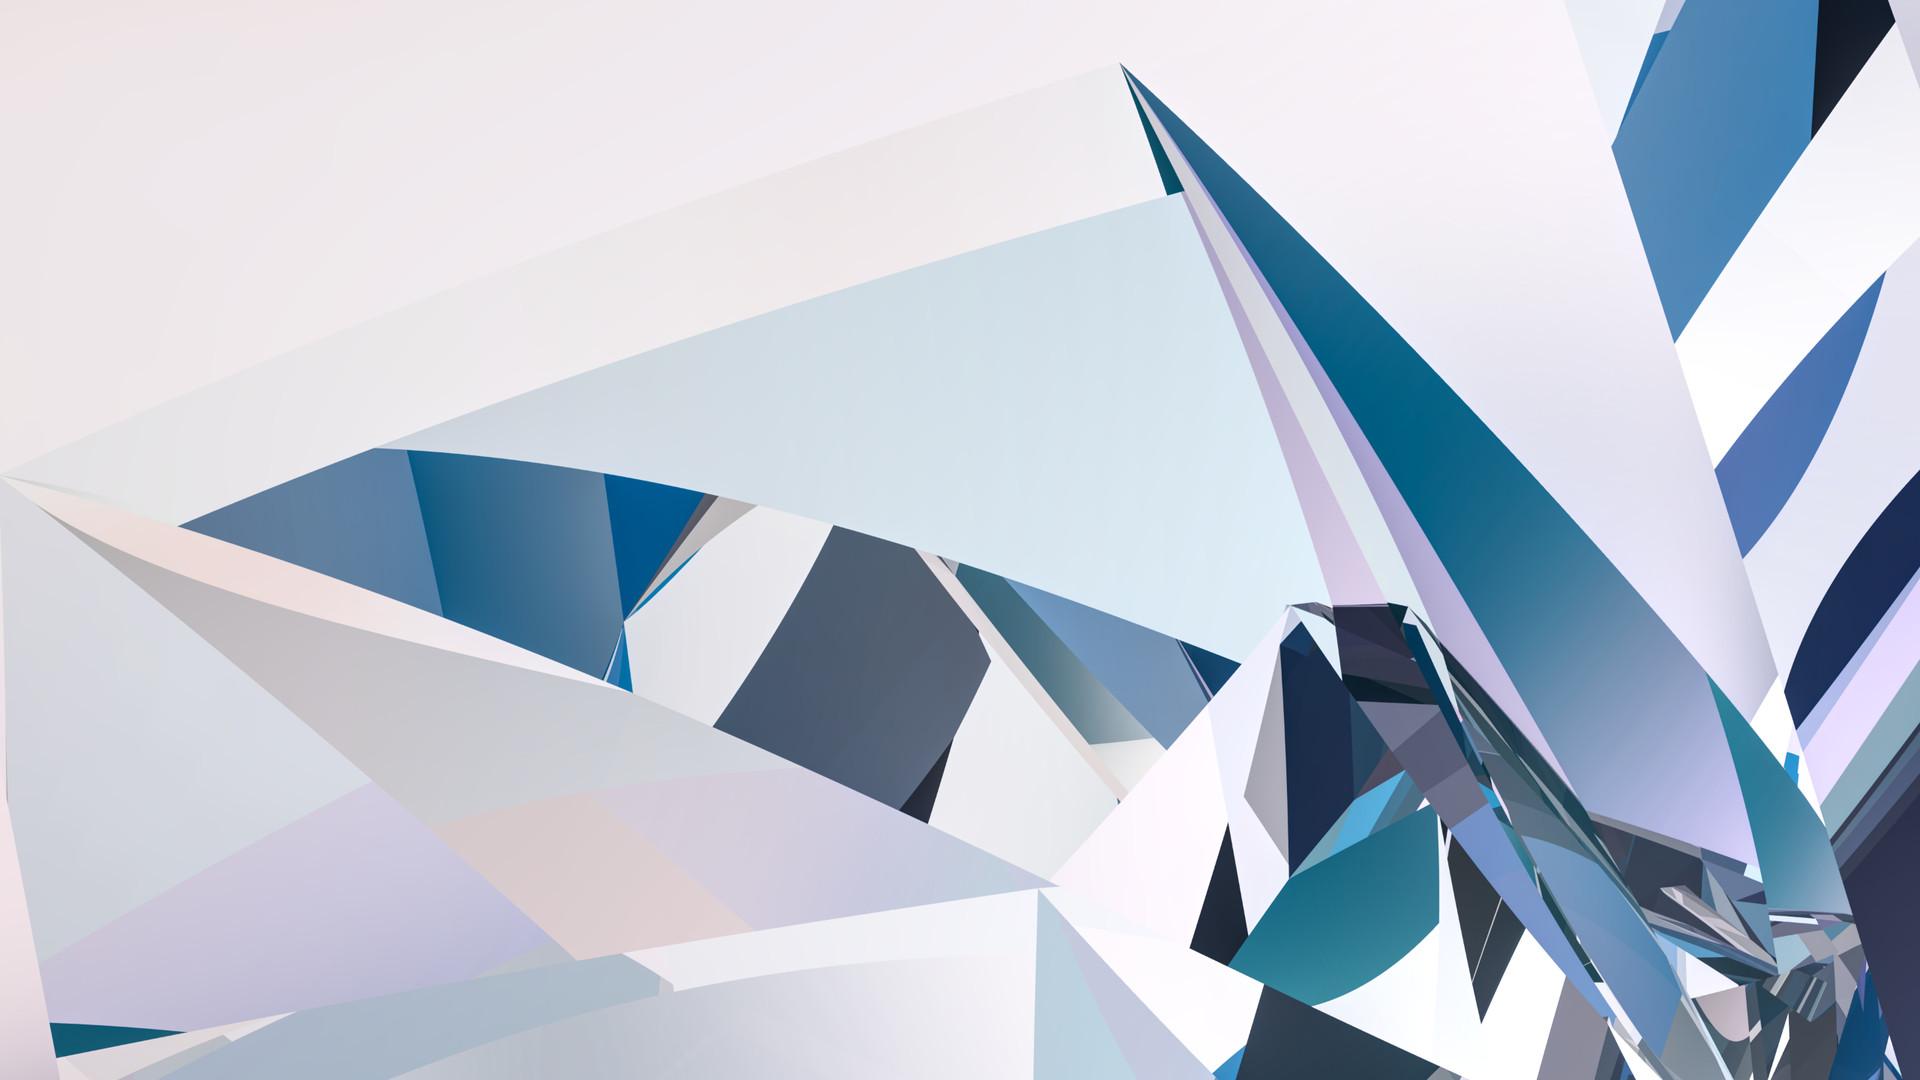 Fragmentic 02